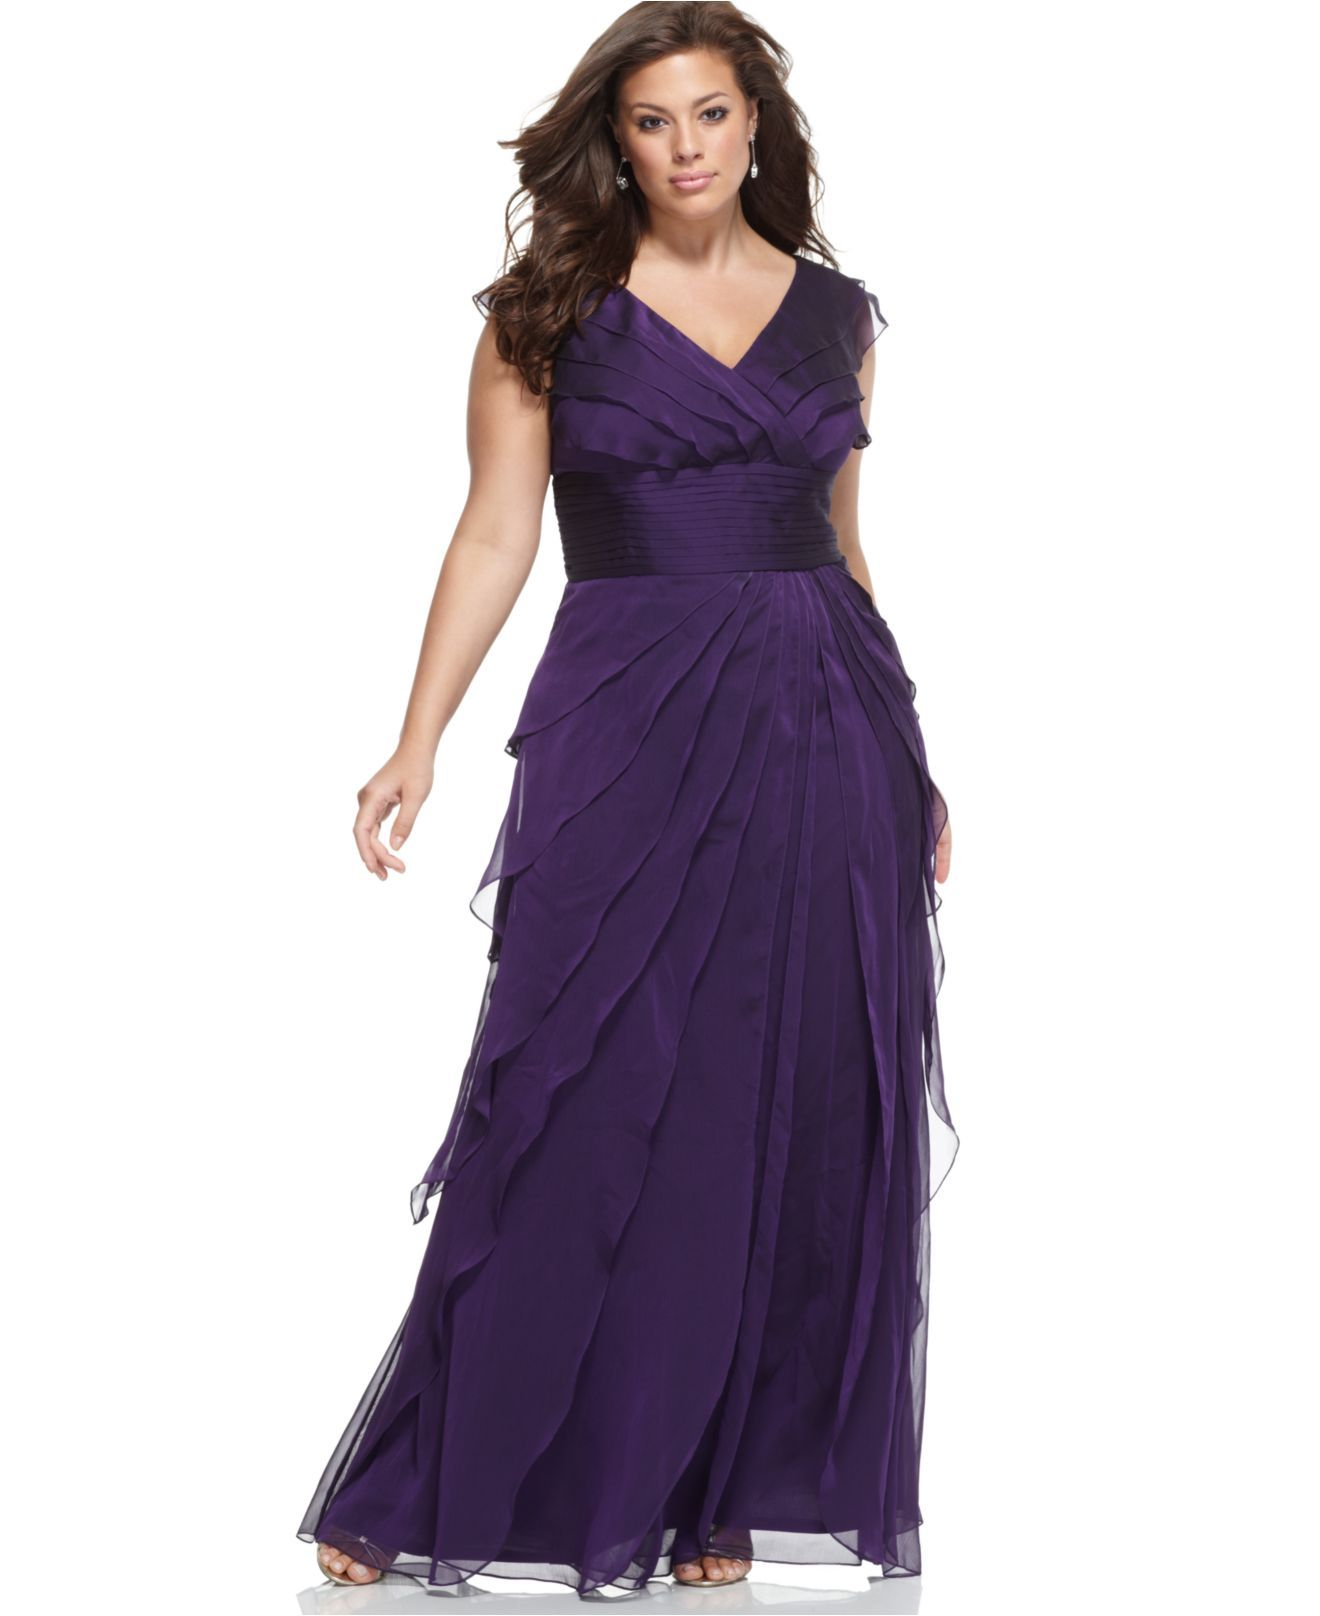 Macys Mother Of Bride Gowns Long